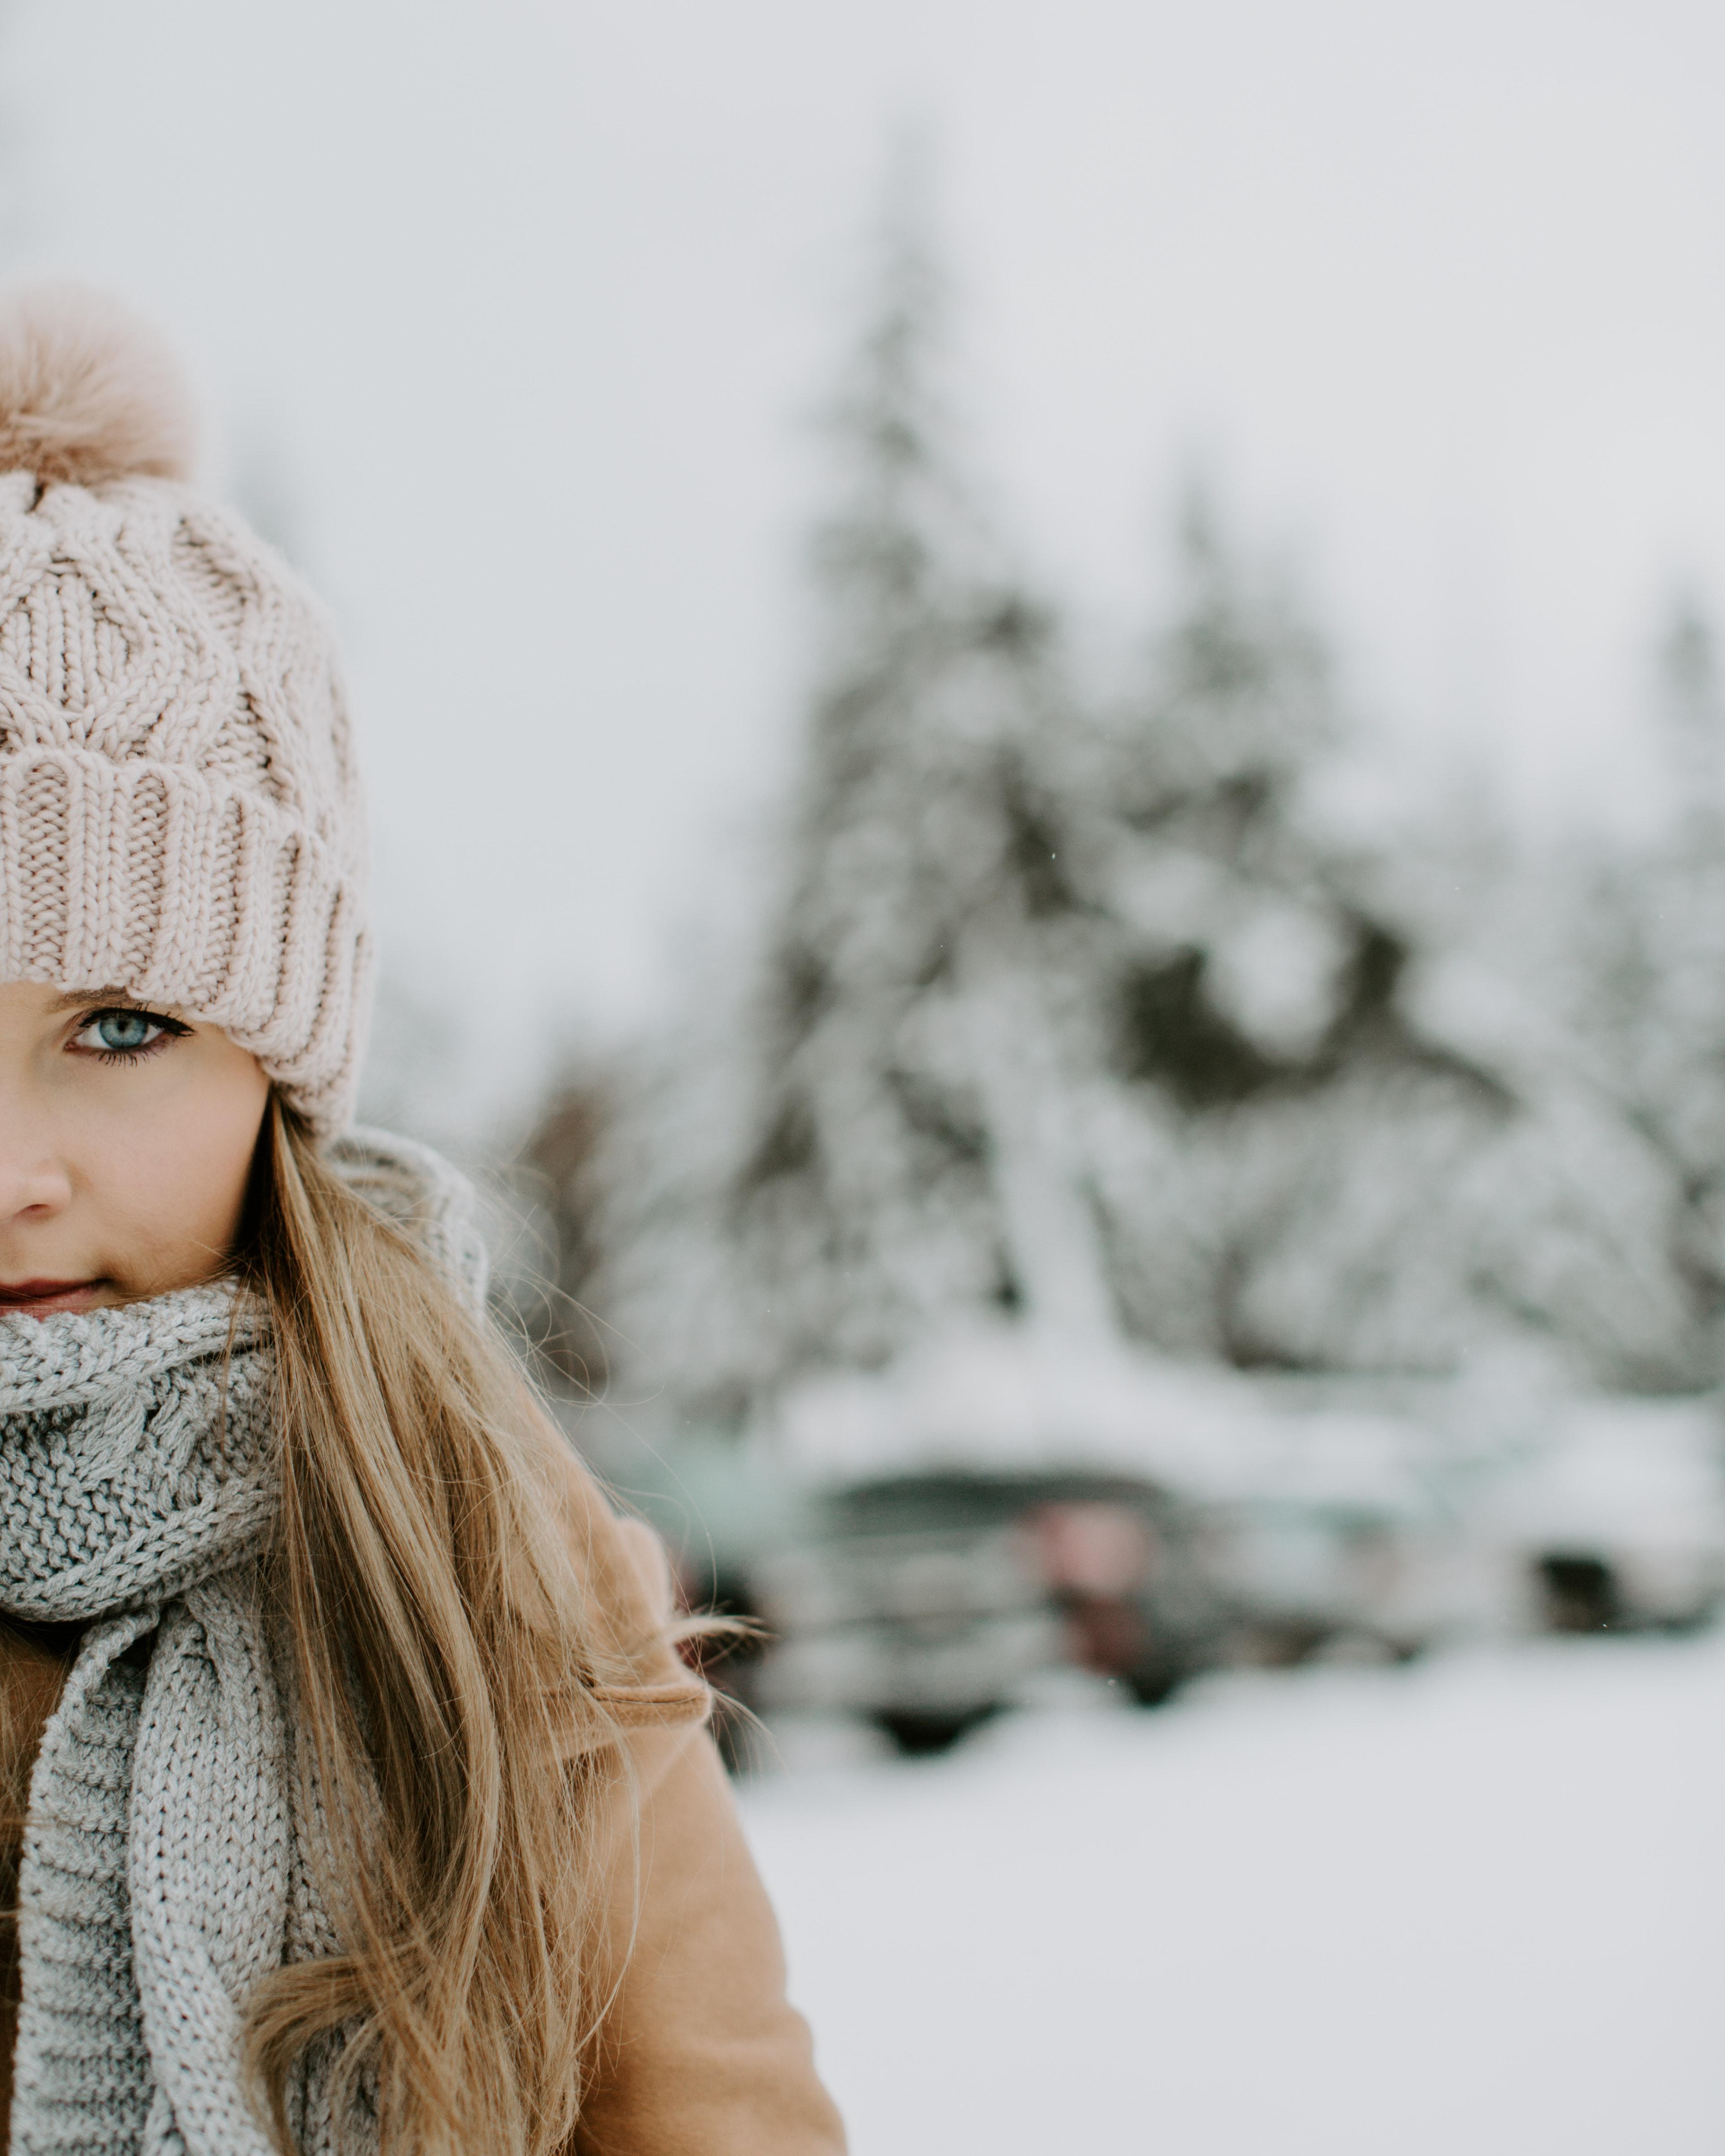 Girl Wearing Winter Outfit on Snowy Field, Blonde hair, Portrait, Wool, Woman, HQ Photo